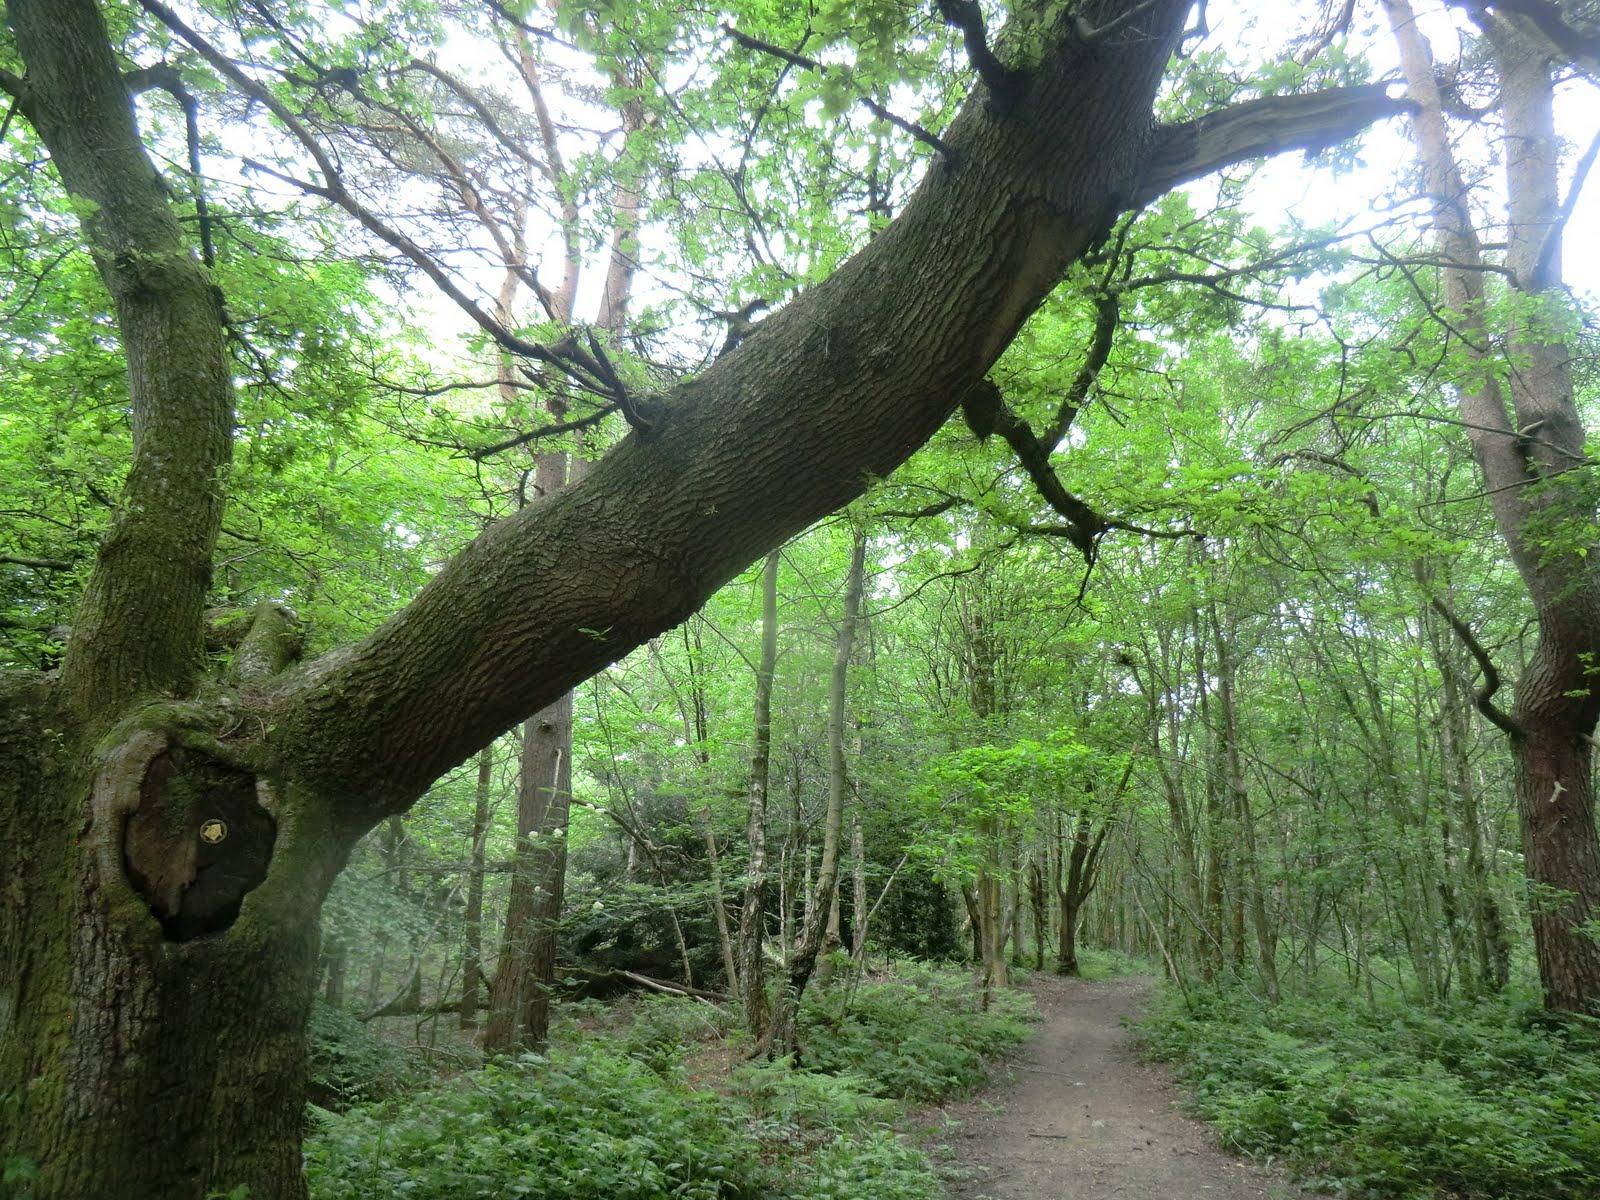 CIMG4416 Crockhamhill Common